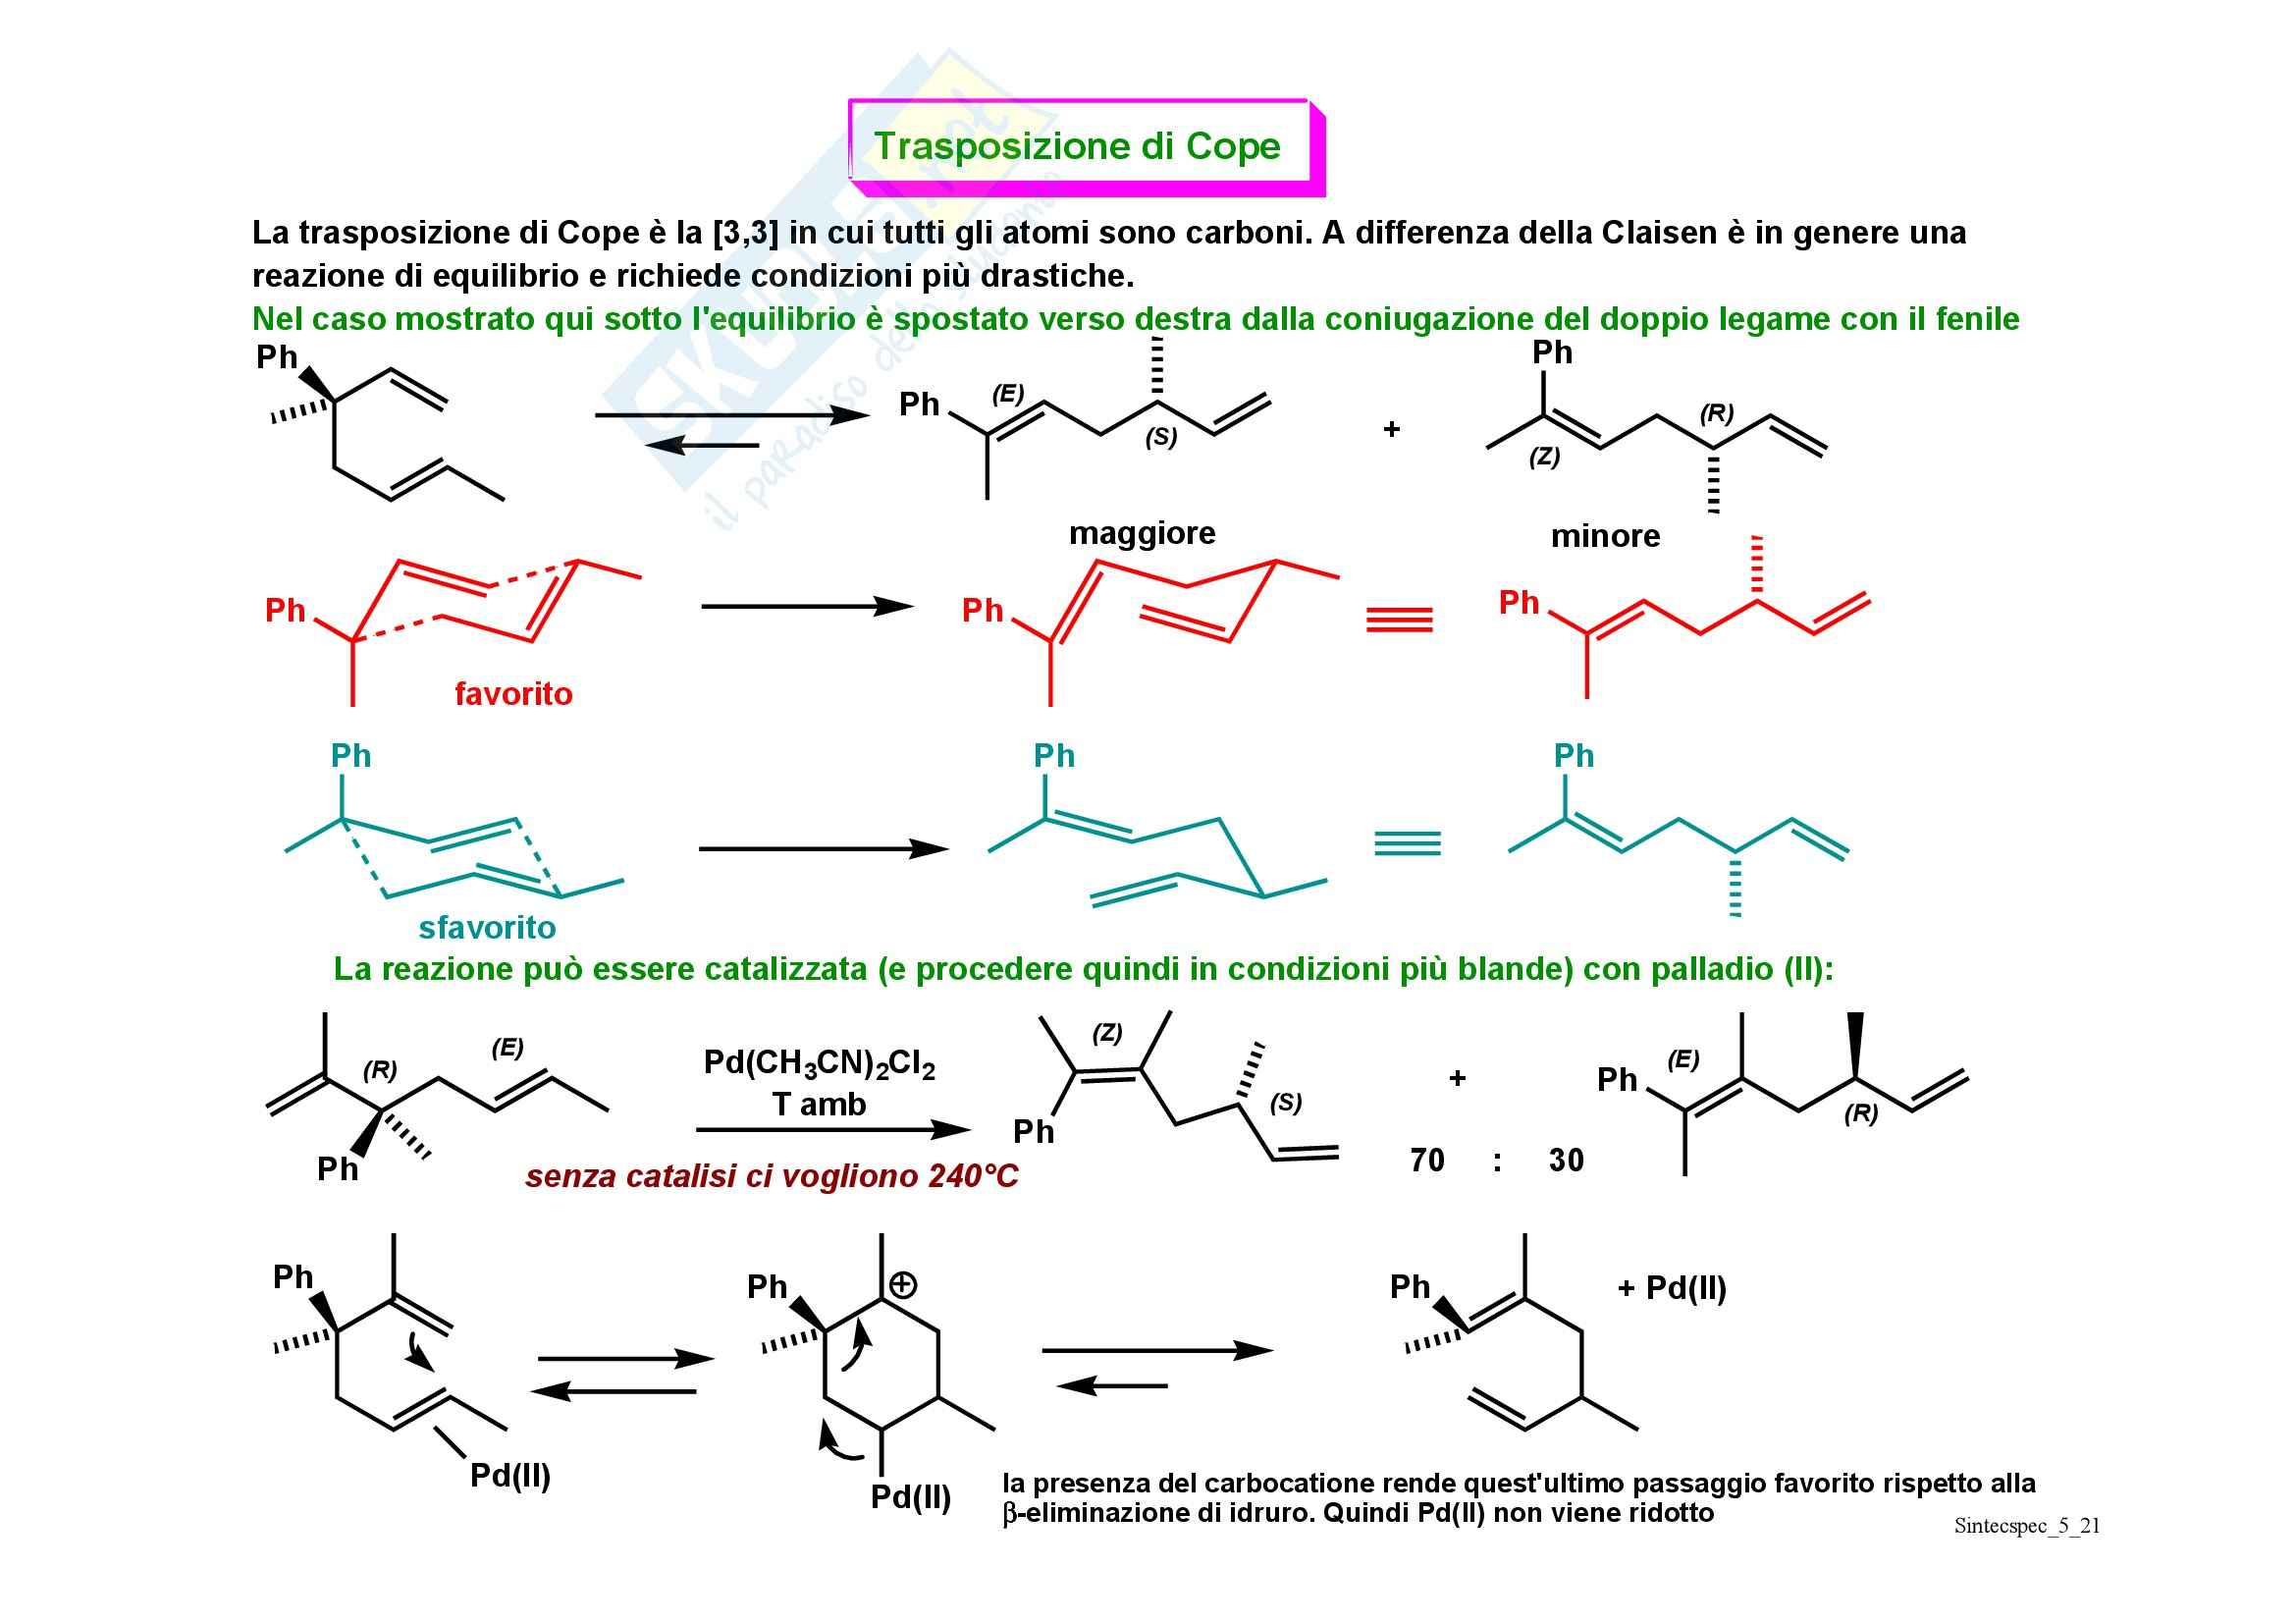 Chimica organica - Diels-Alder Pag. 21